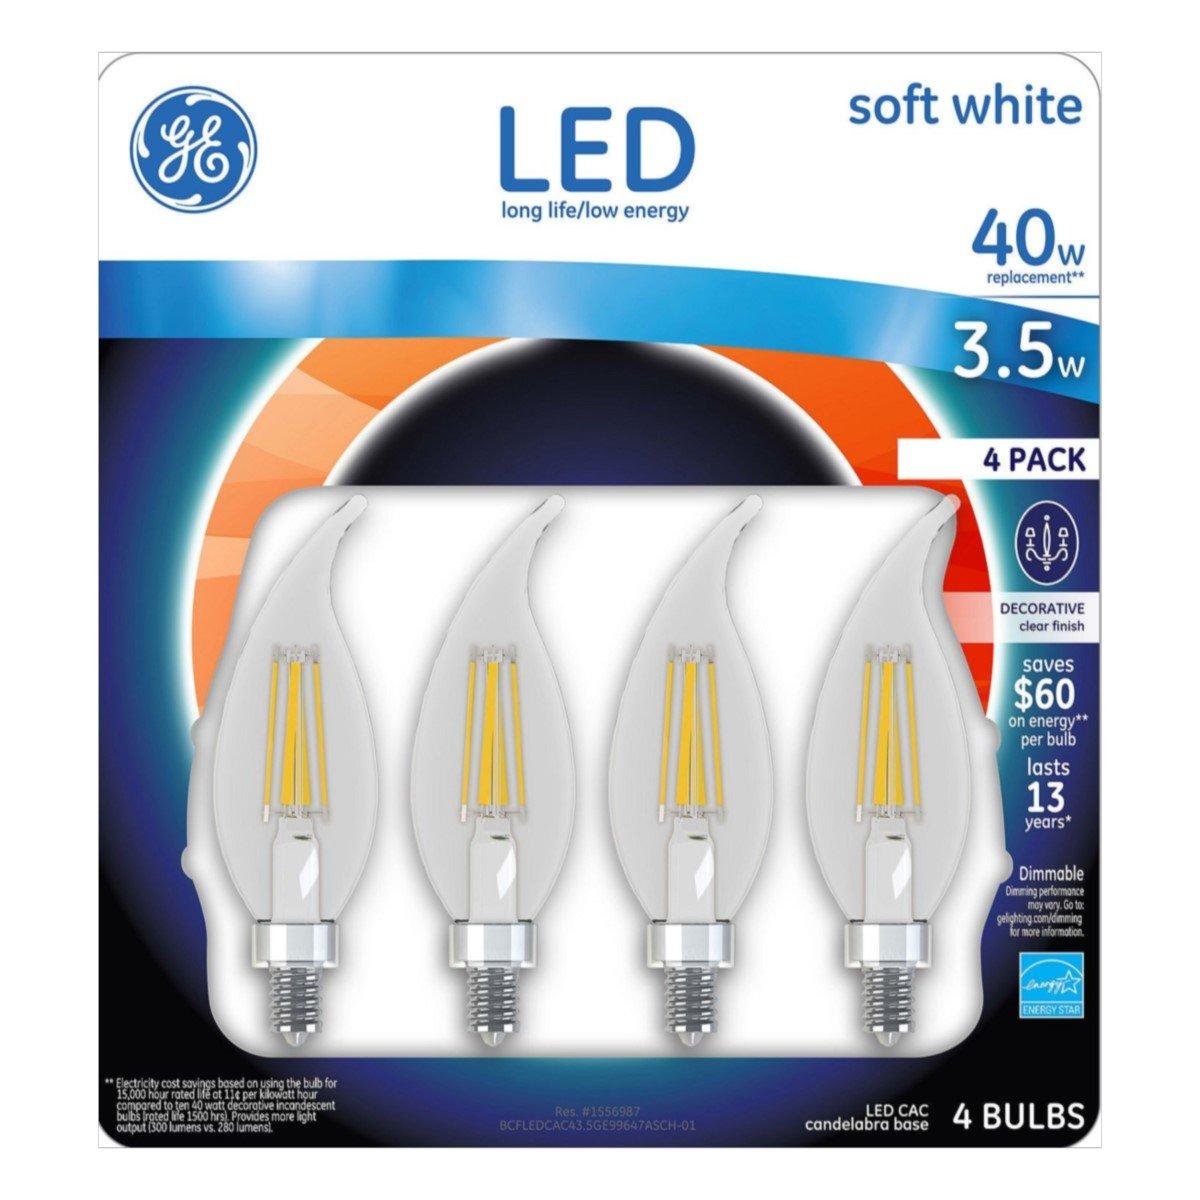 GE Candelabra LED Light Bulb 3.5-Watt Dimmable 2700K Soft White 40-Watt Equivalent 300-Lumens Chandelier Long-Life Low-Energy Decorative Clear Finish 4-Pack